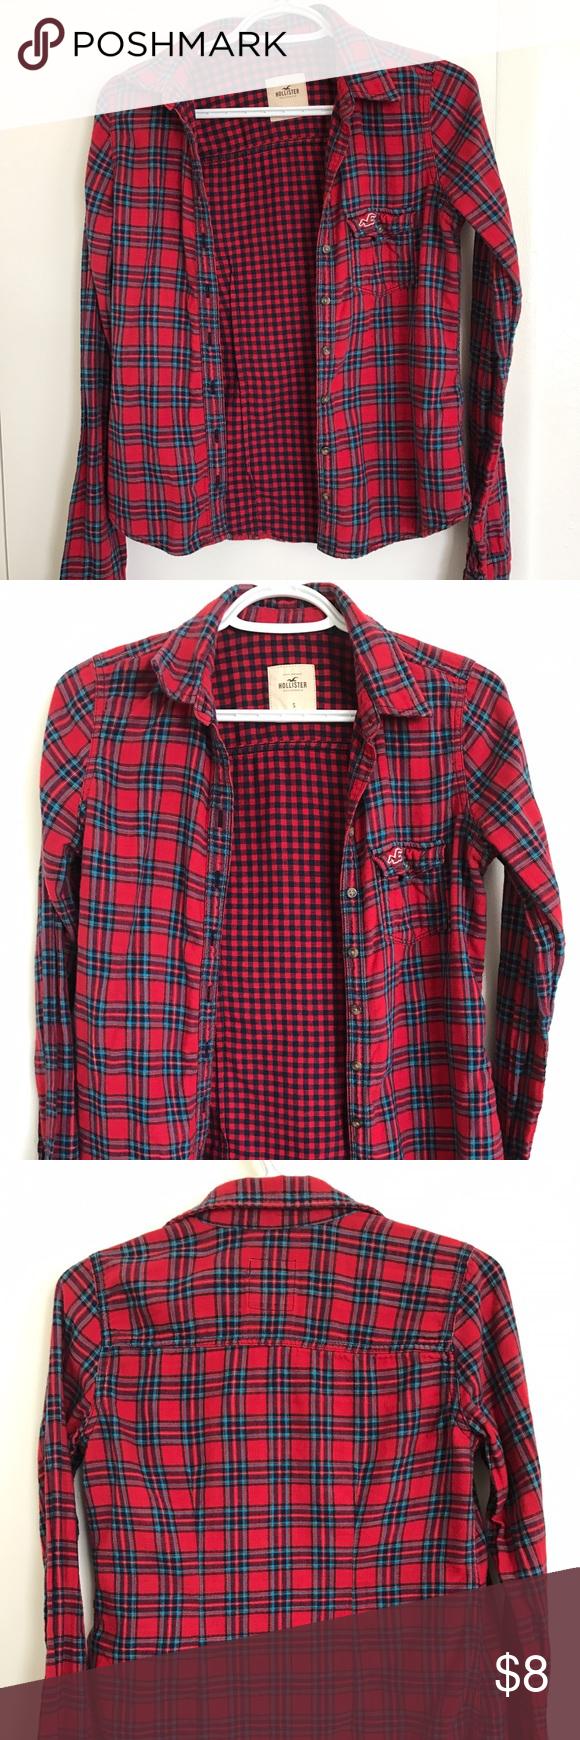 Hollister plaid shirt Size S Hollister Tops Button Down Shirts